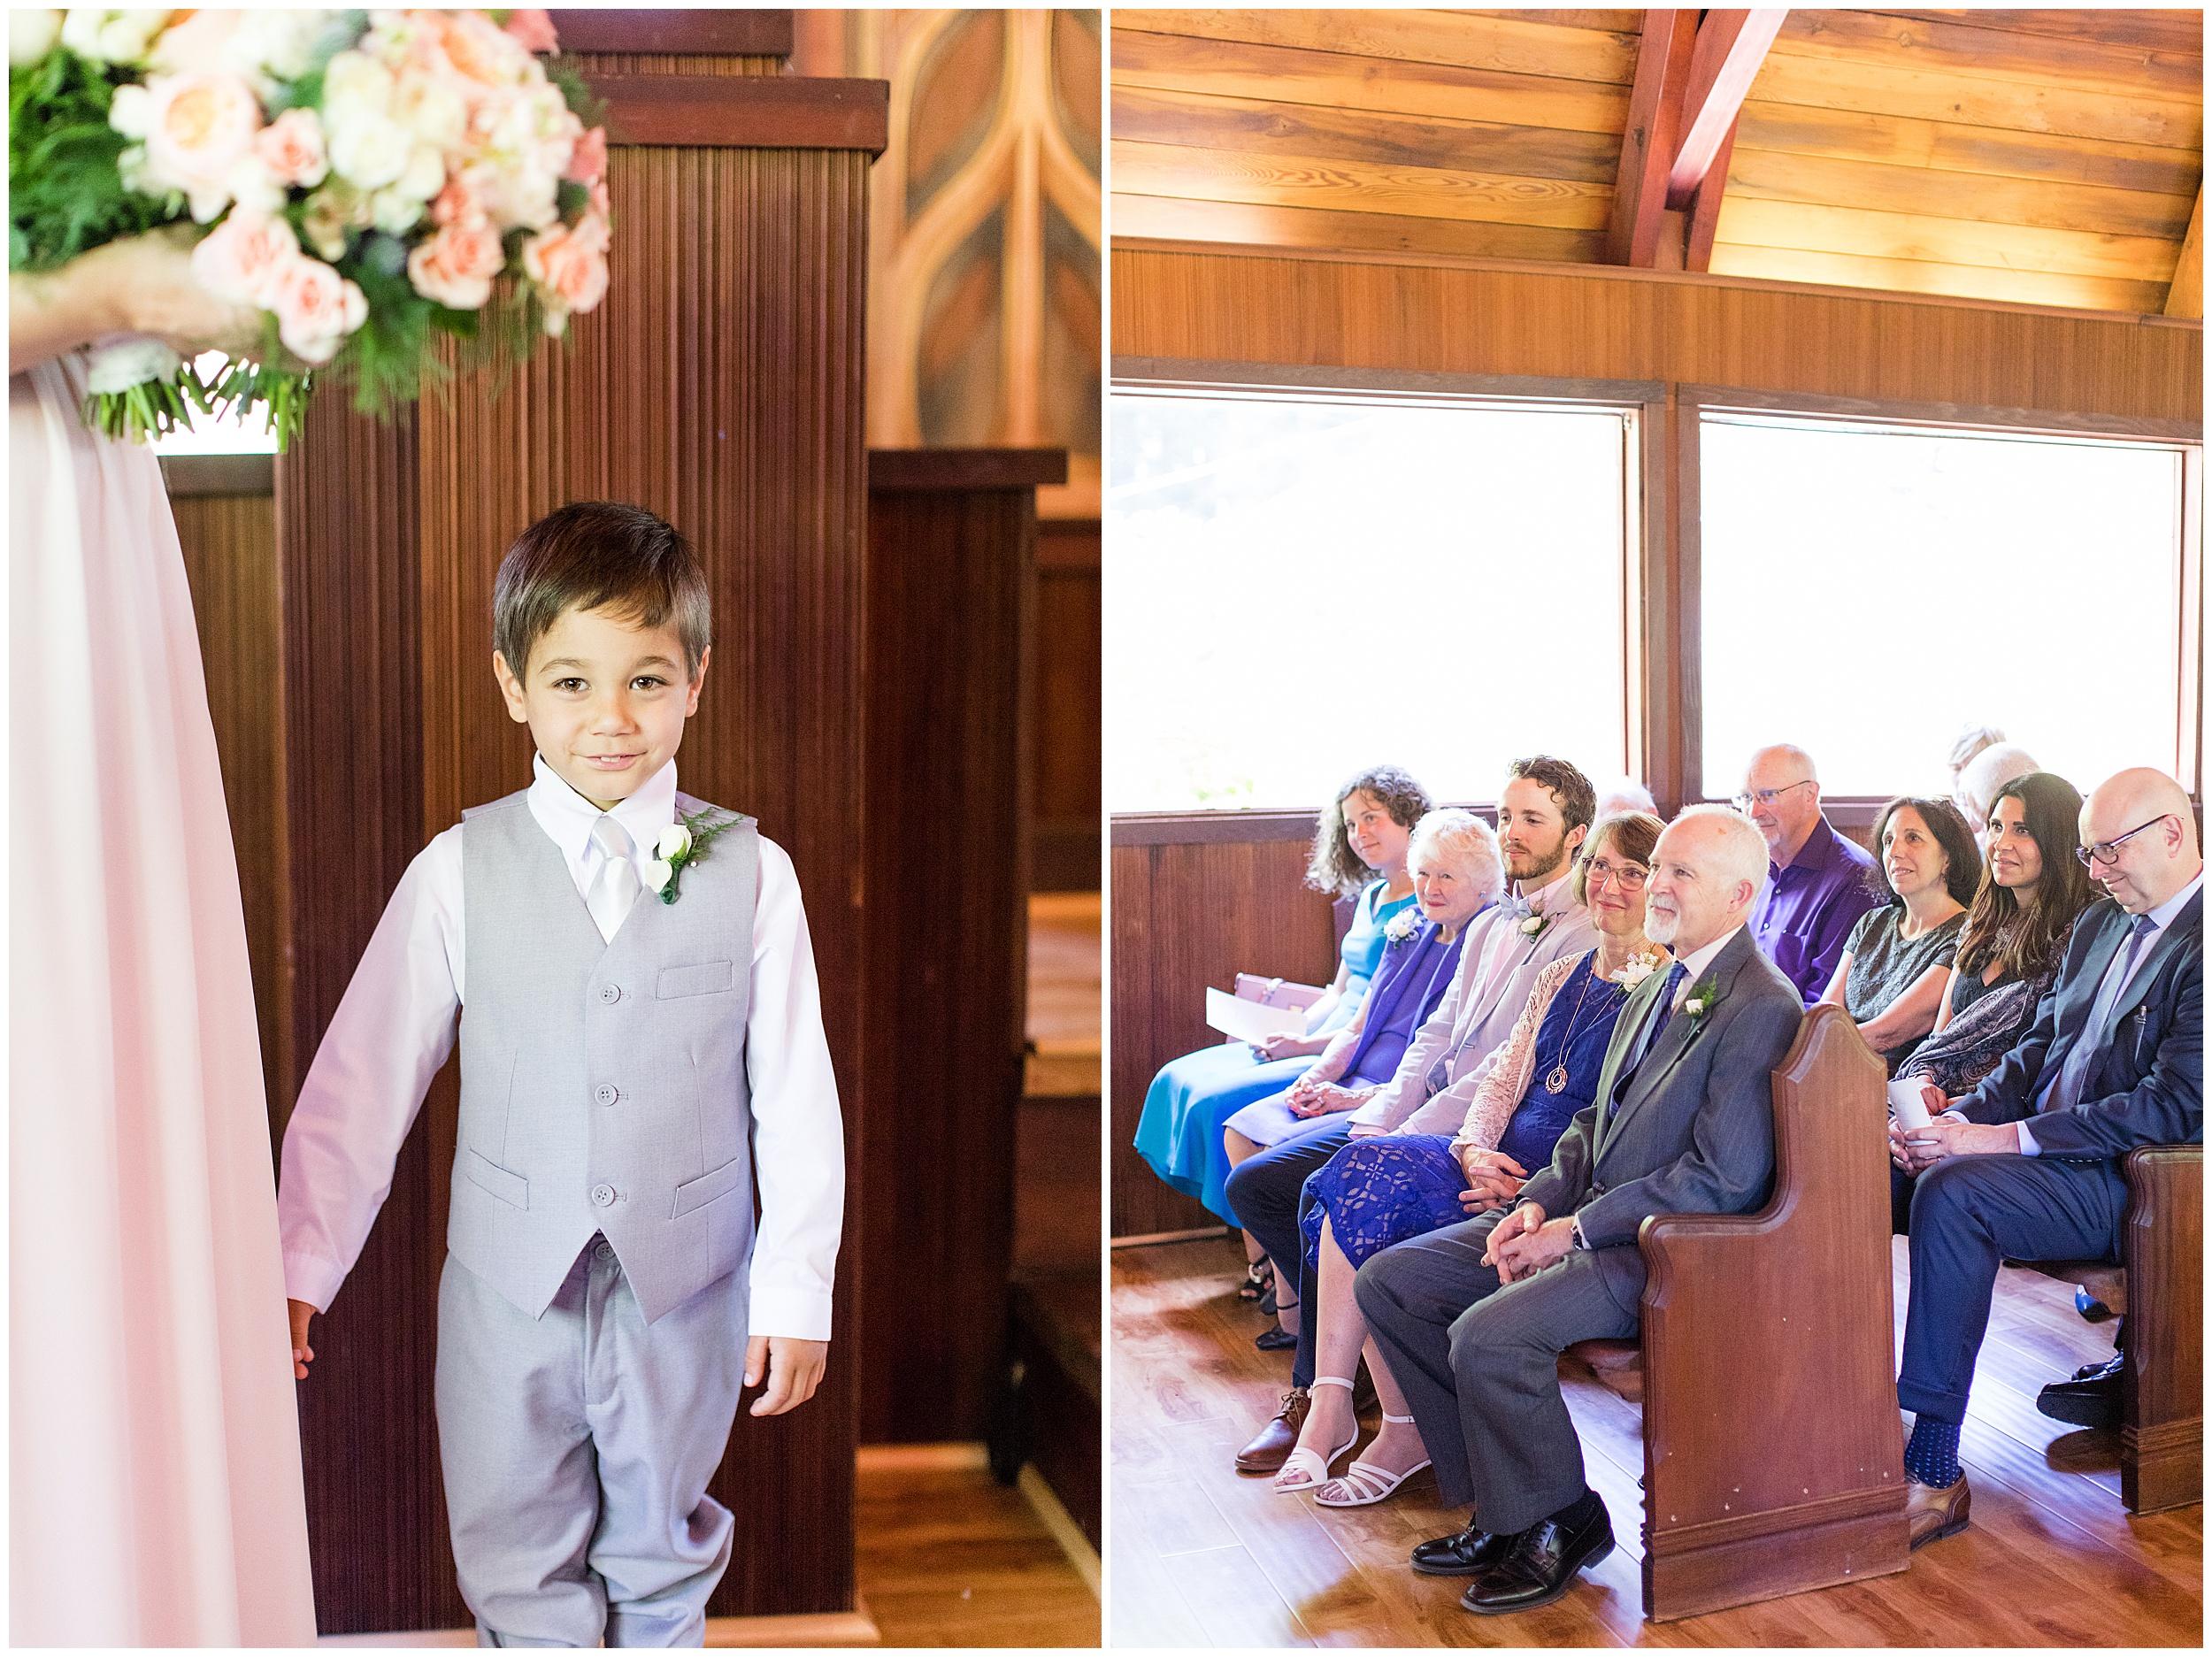 2019 chapel on the hill los gatos san jose bay area wedding photographer angela sue photography_0029.jpg